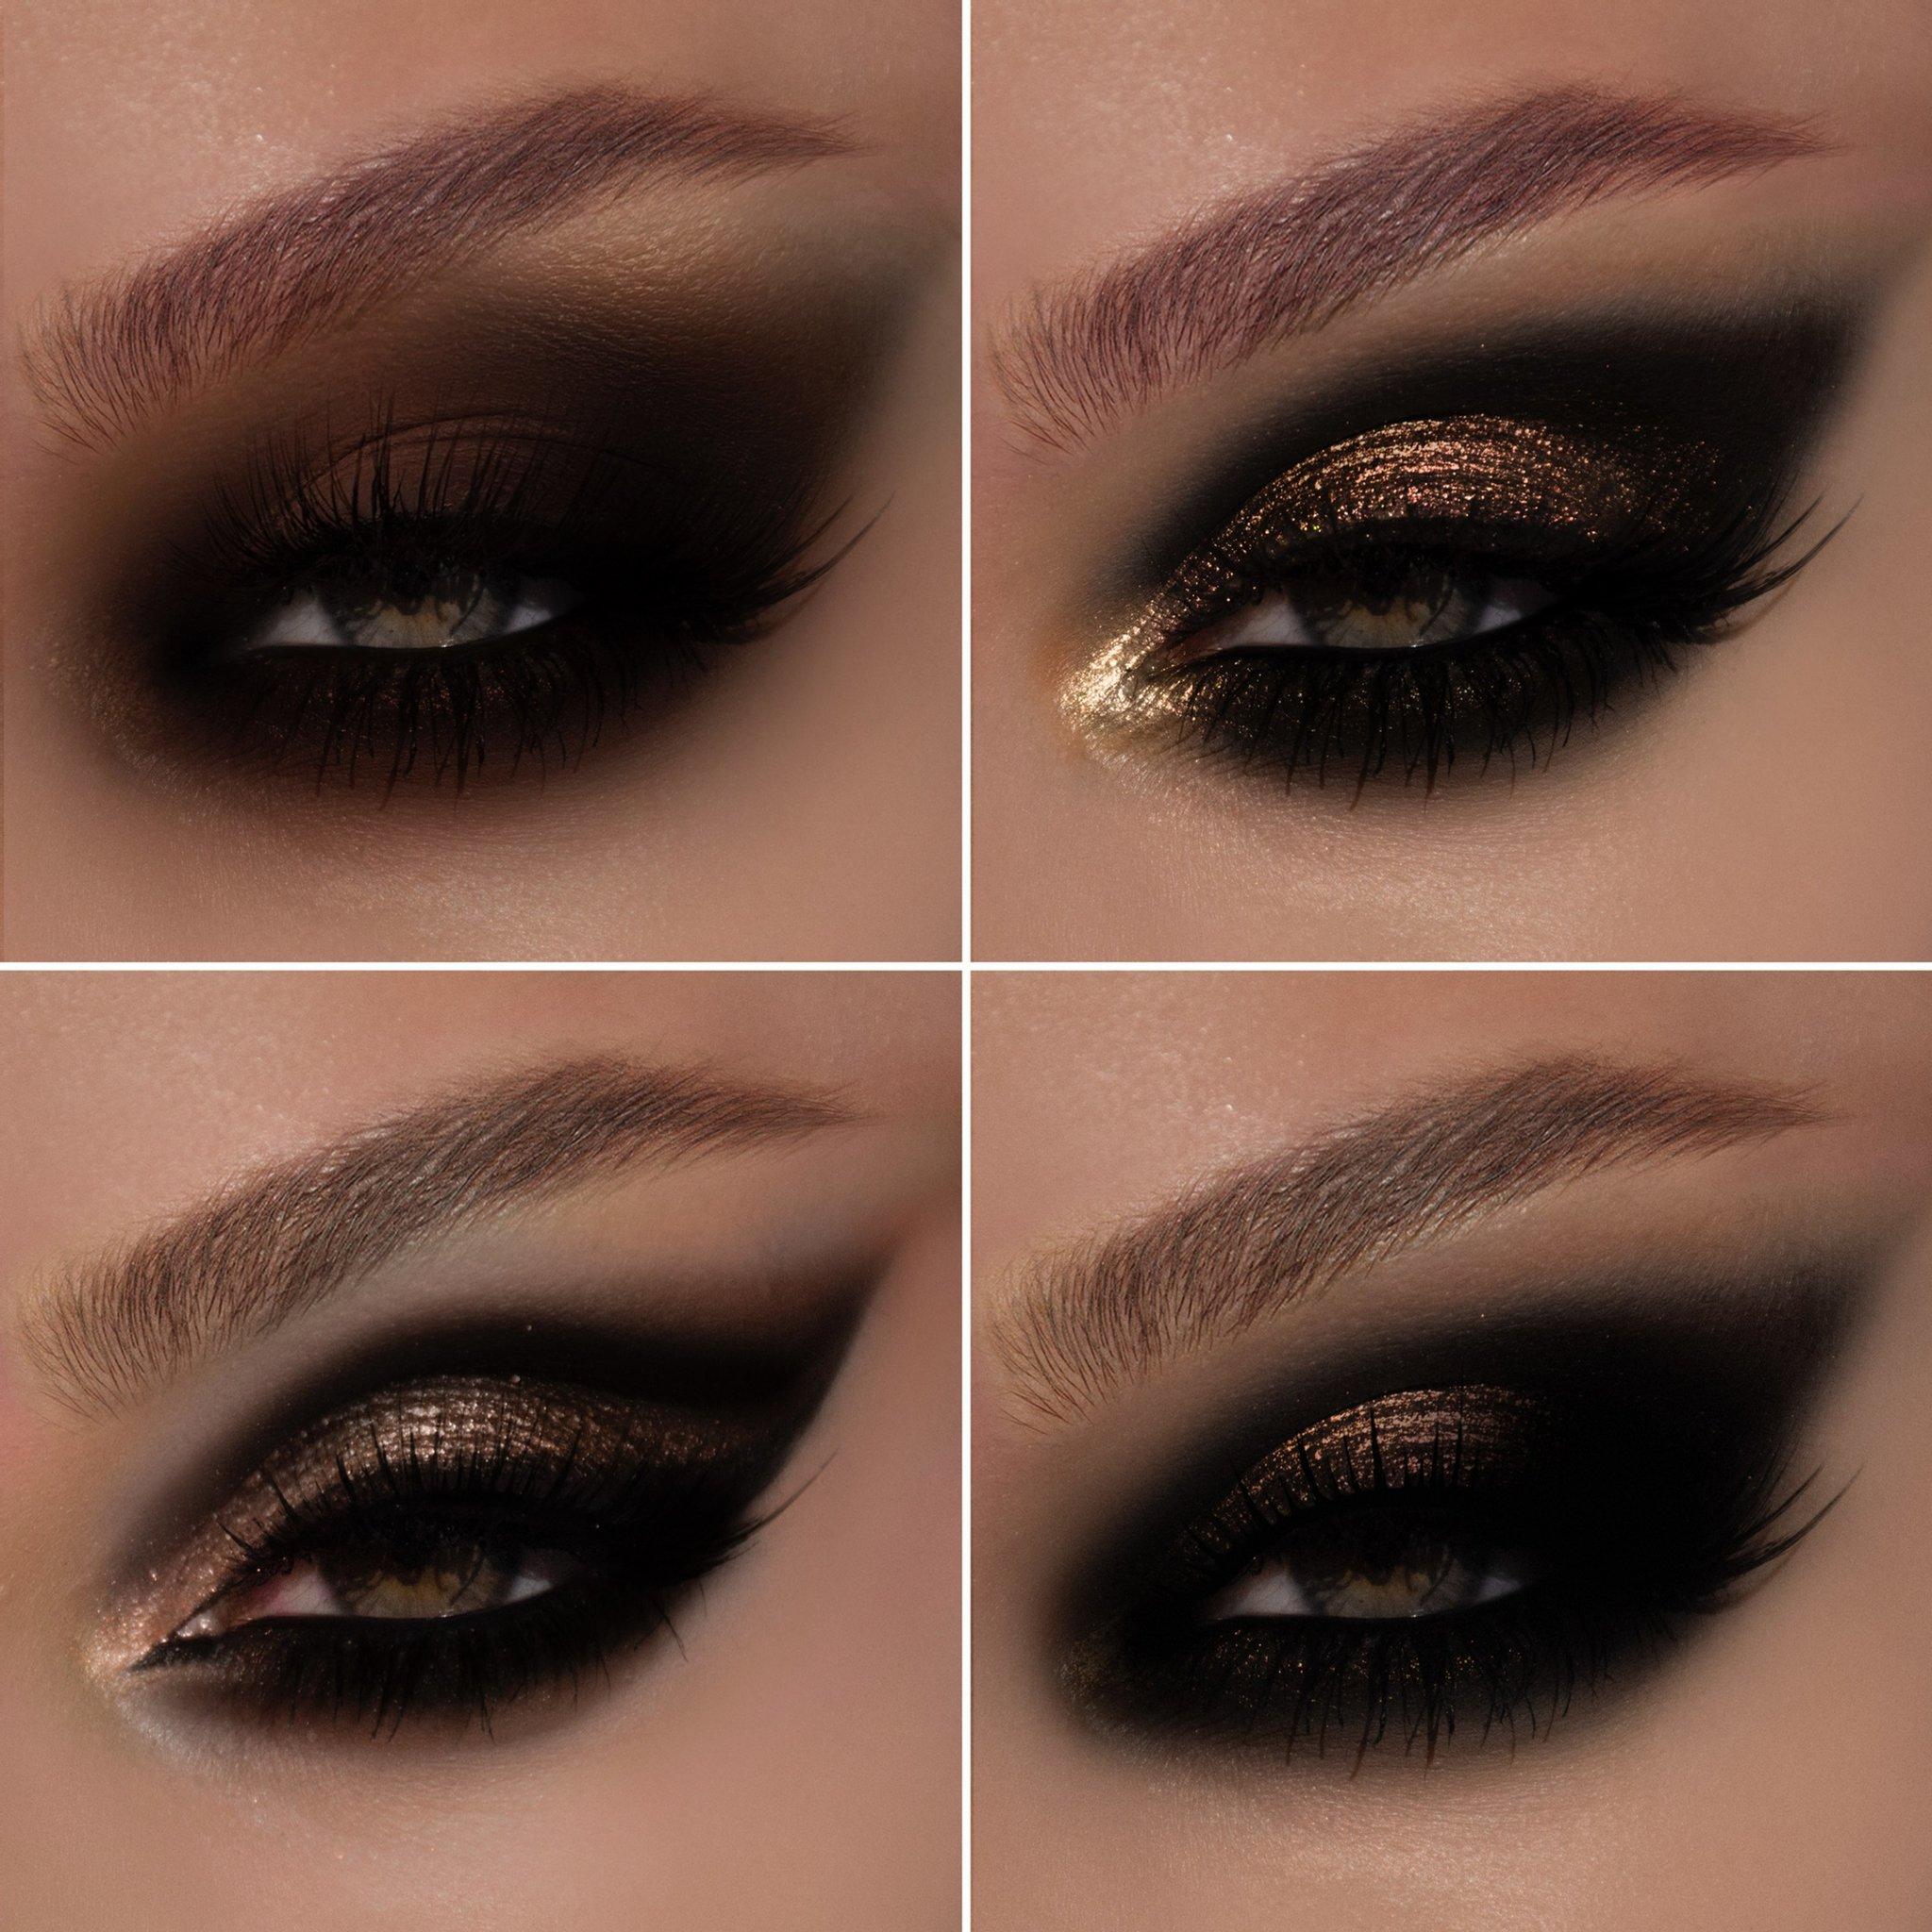 AL.RUTKOVSKIY Cosmetics Mango Eyeshadow Palette